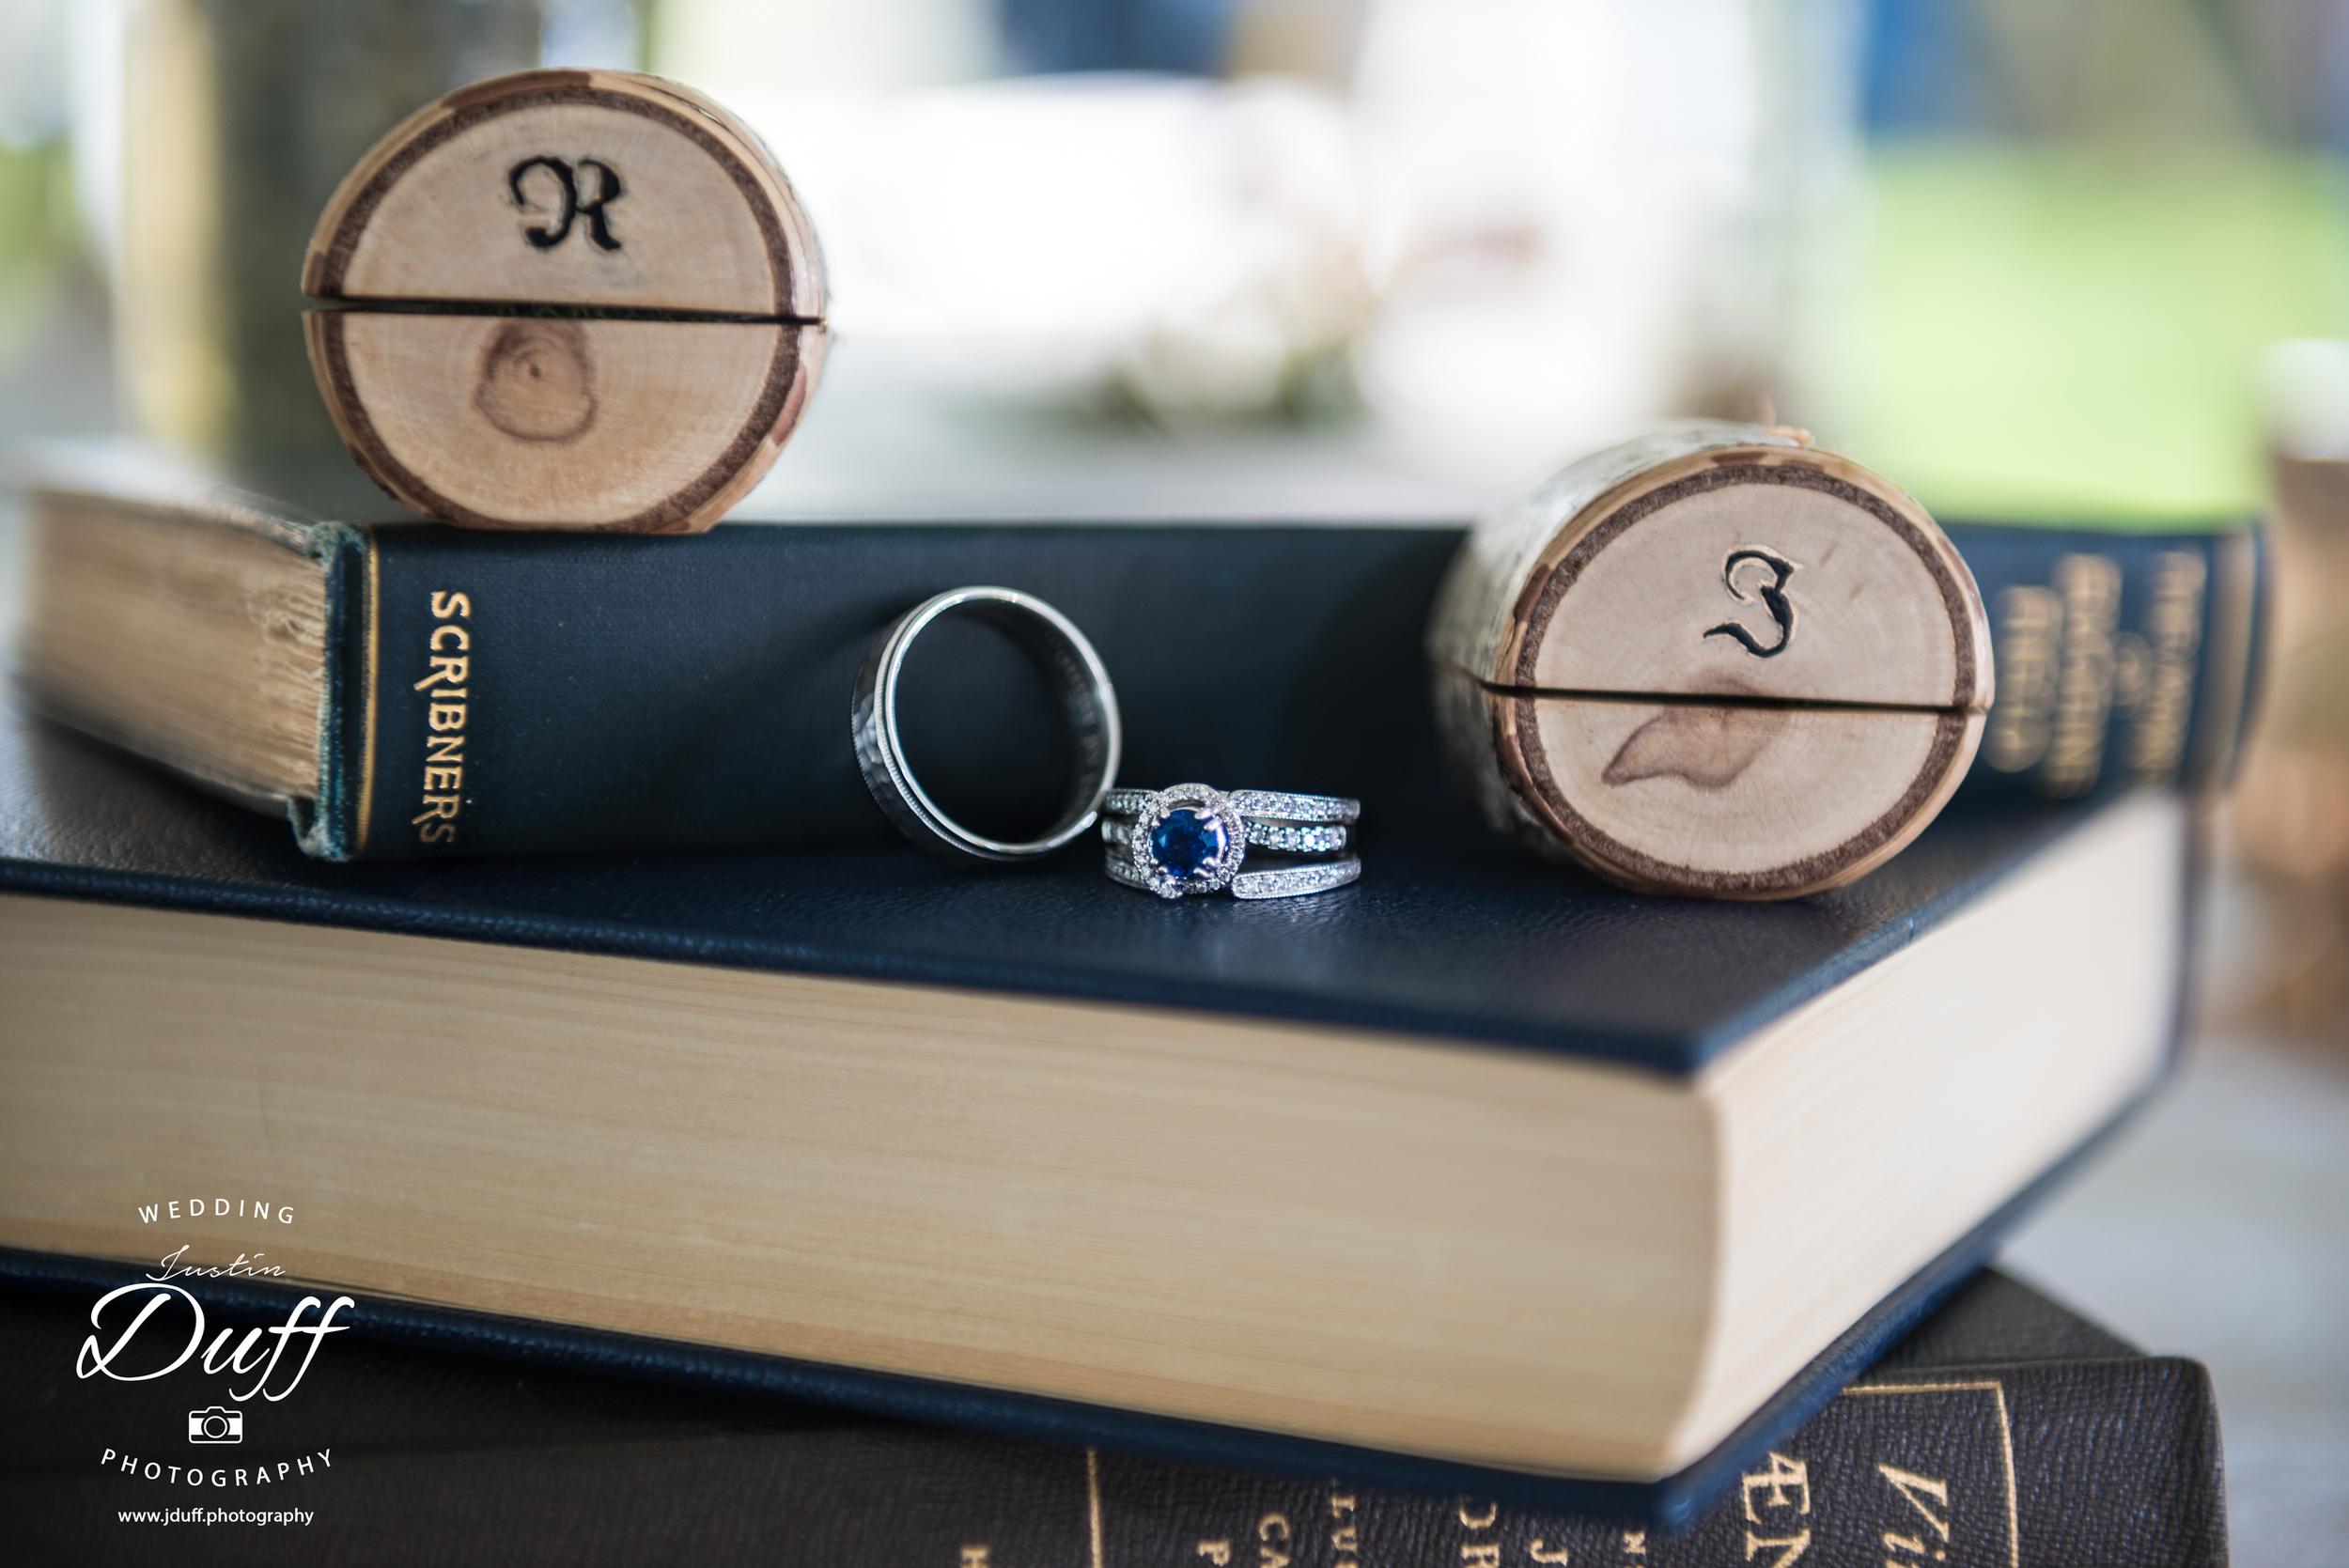 Stoney Creek Metropark – A Vintage Wedding - wedding rings on books custom boxes